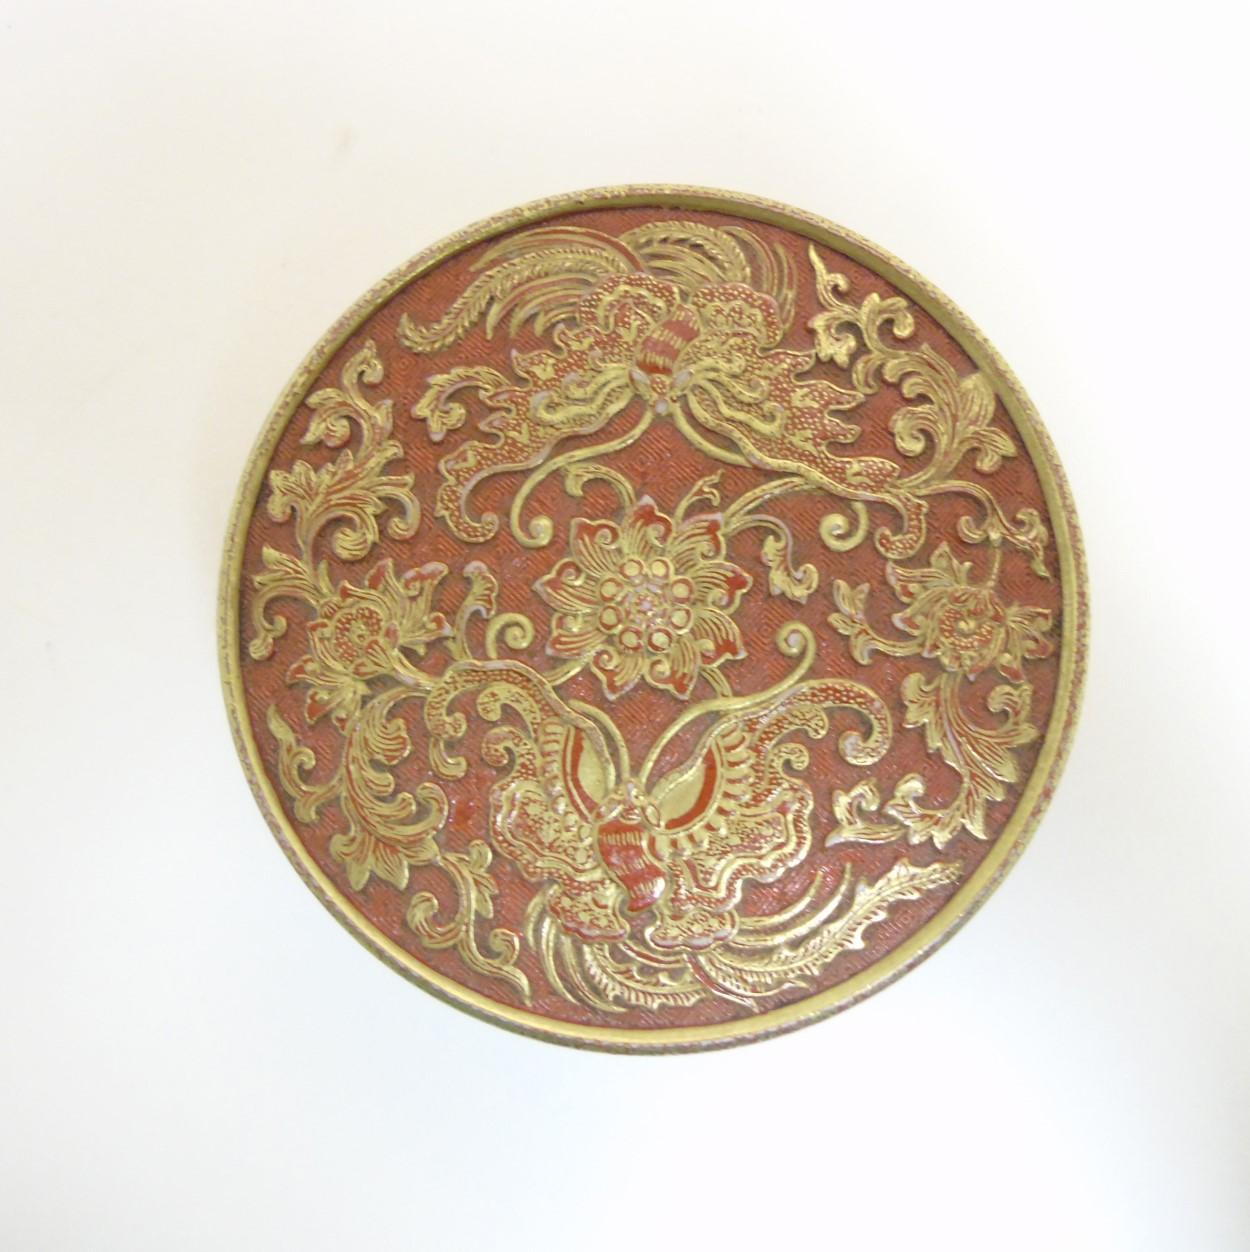 Lot 26 - A Chinese burnt orange circular inkstone / pot,